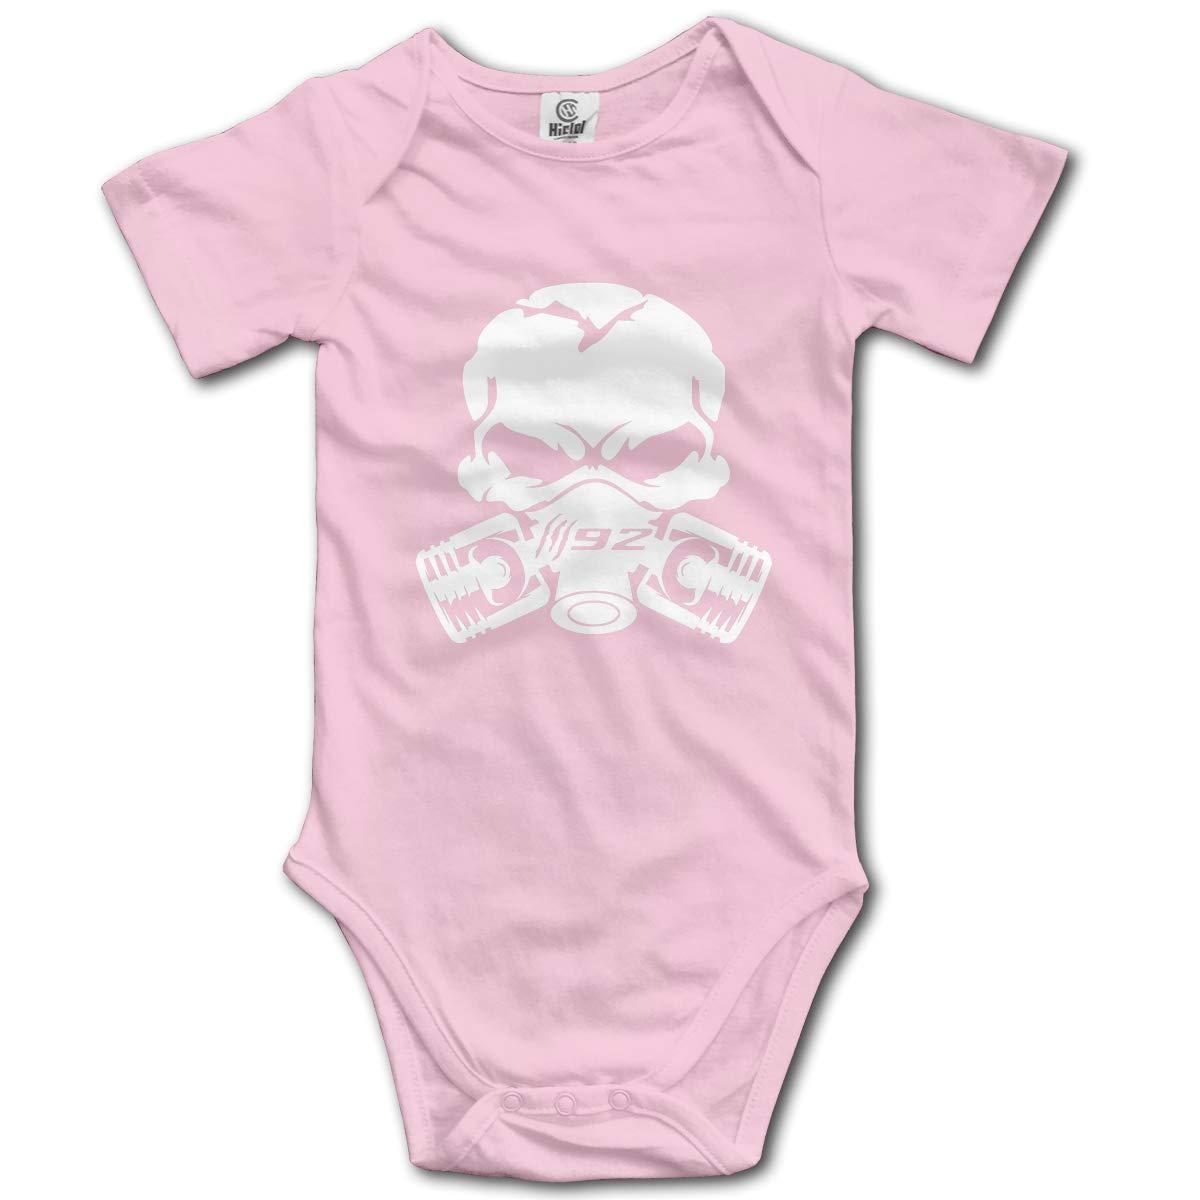 Claw Marks 392 Piston Gas Mask Skull Baby Romper 0-18 Months Newborn Baby Girls Boys Layette Rompers Black